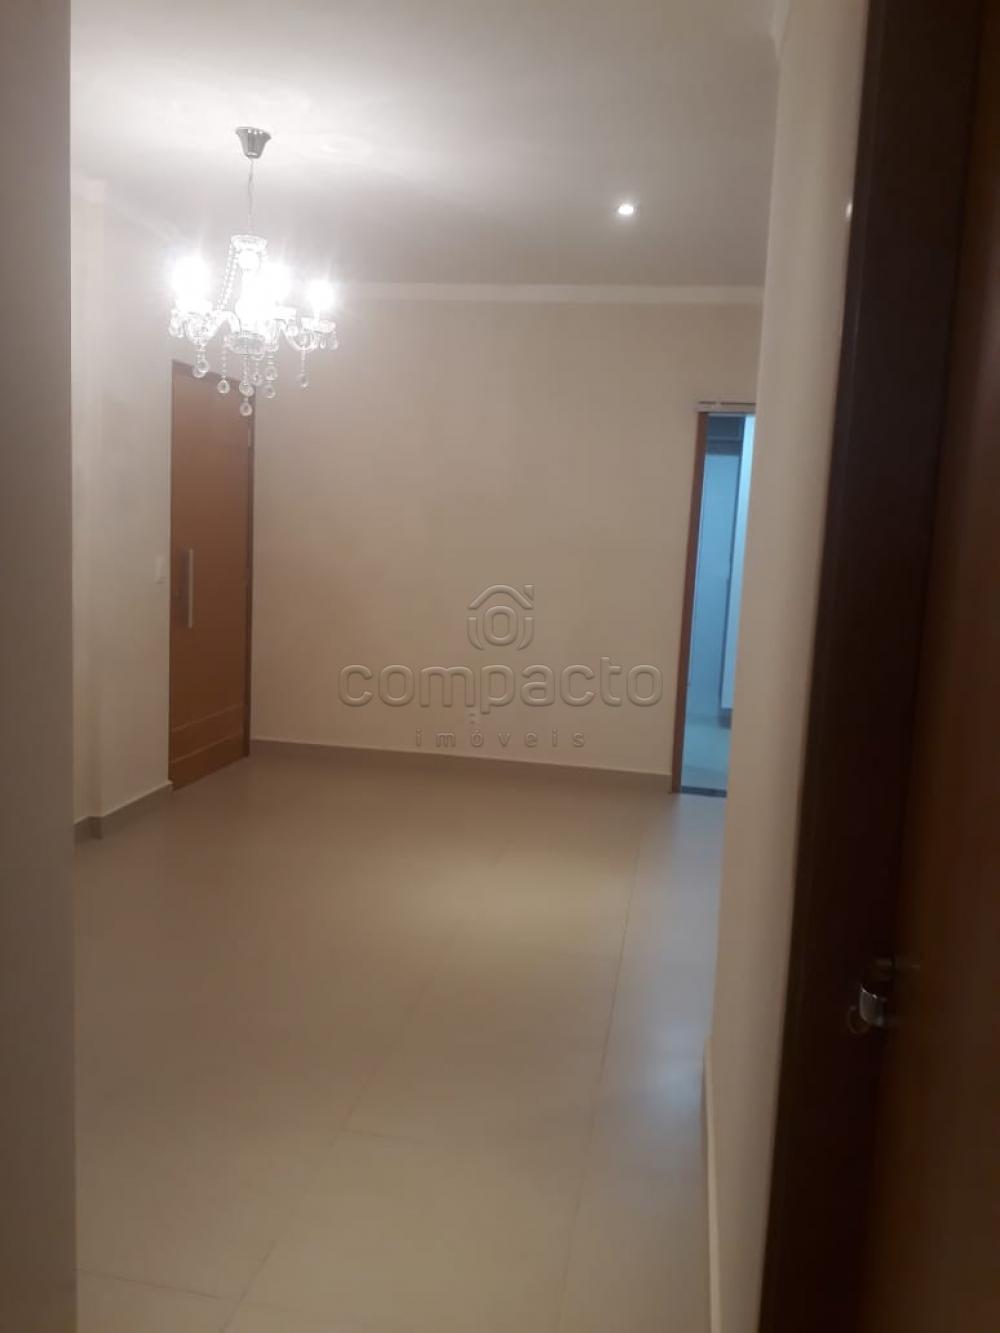 Sao Jose do Rio Preto Apartamento Locacao R$ 2.300,00 Condominio R$425,40 3 Dormitorios 1 Suite Area construida 104.00m2